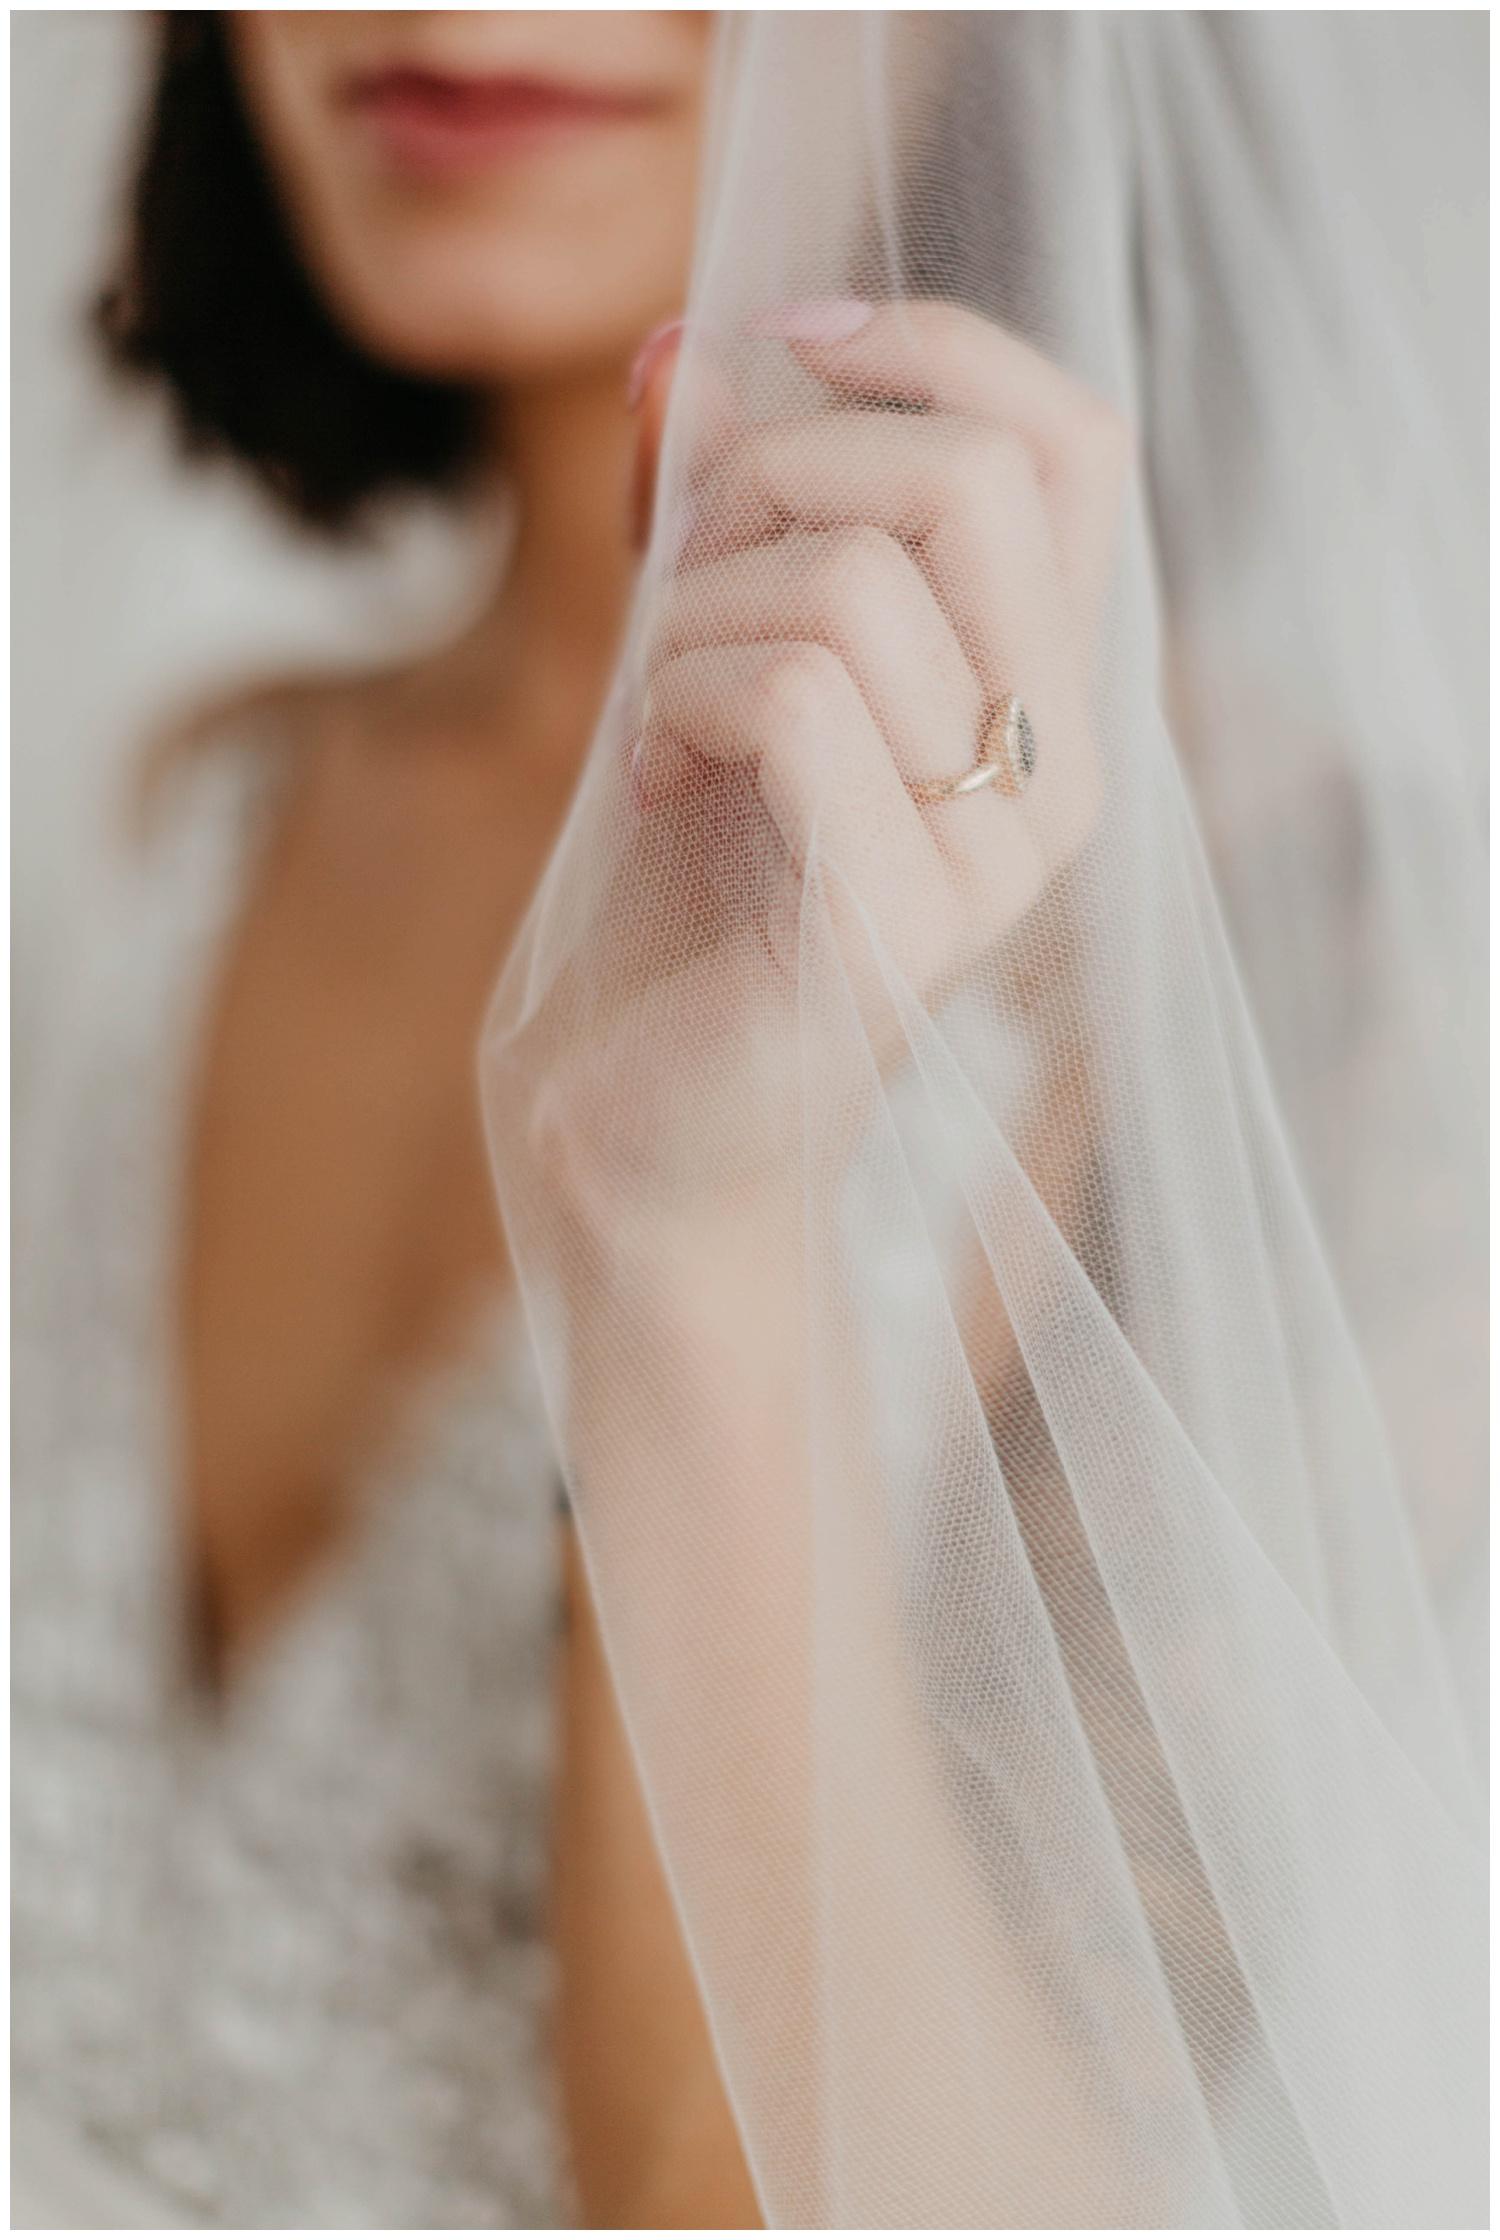 portland_studio_bridal_shoot_truvelle_alexandra_0018.jpg